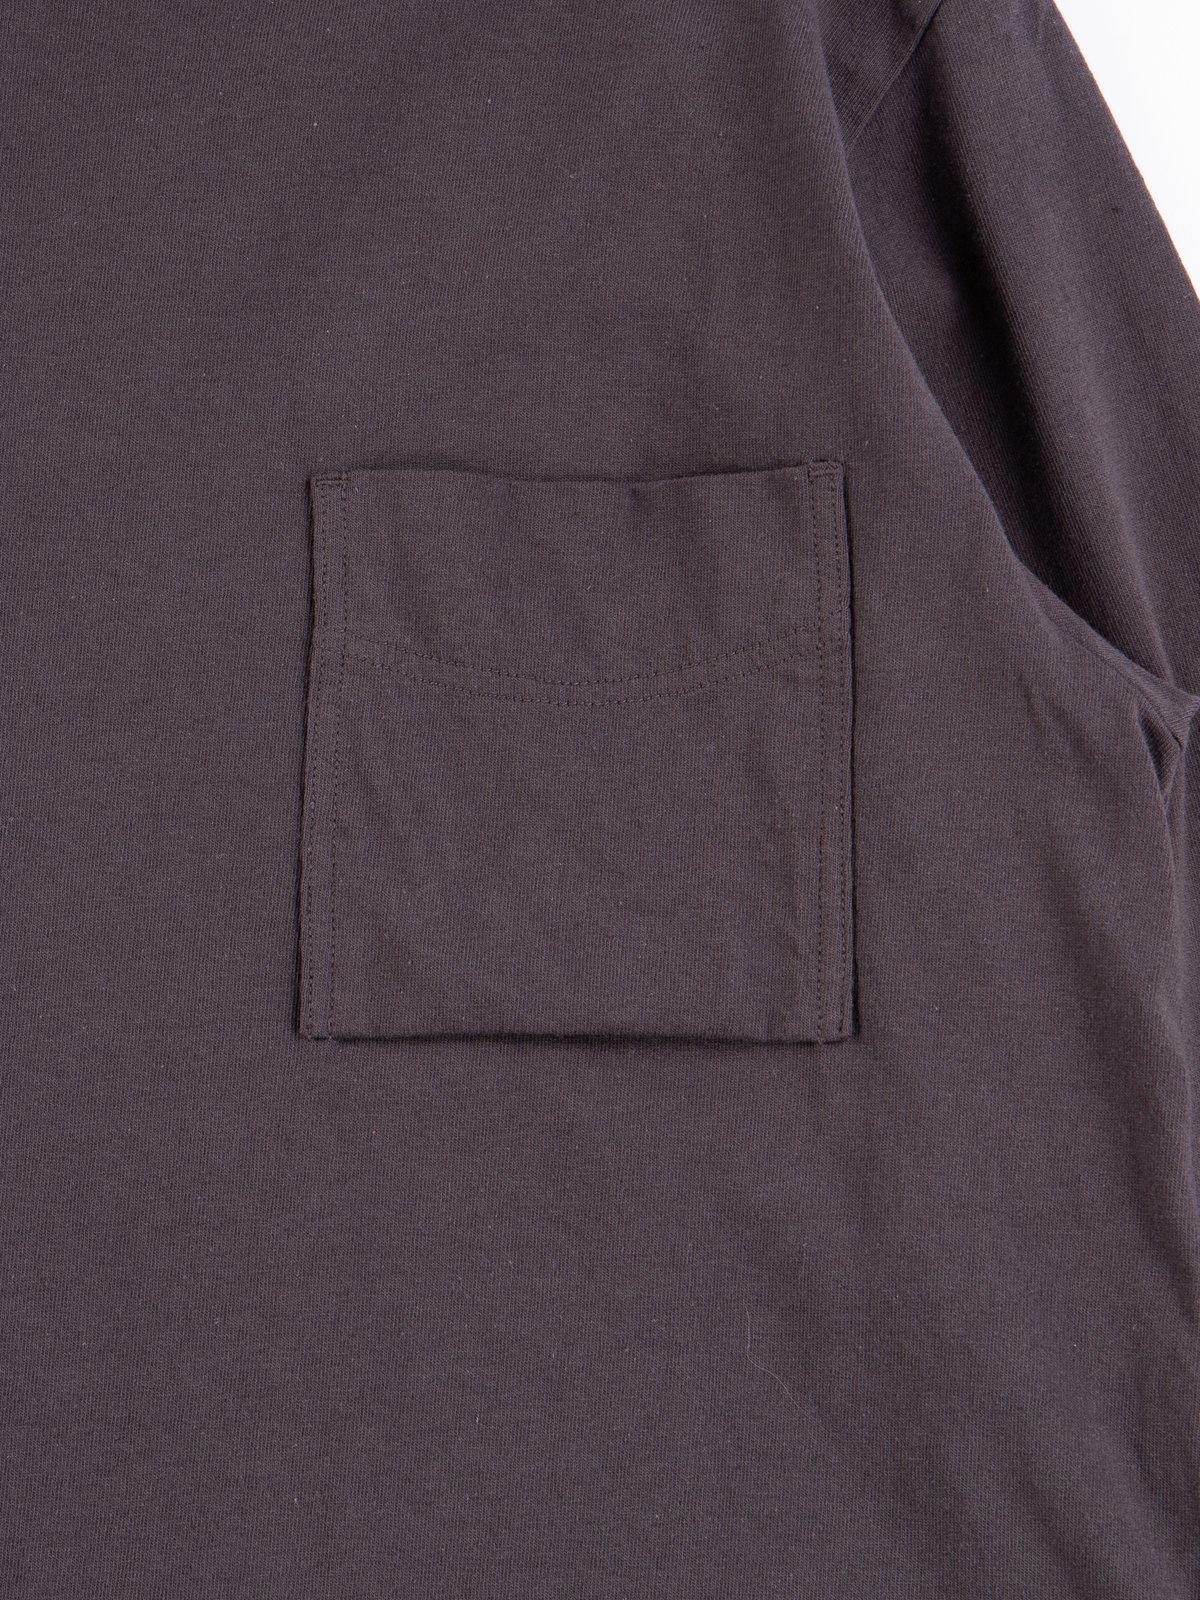 Off Black Long Sleeve Pocket T–Shirt - Image 4